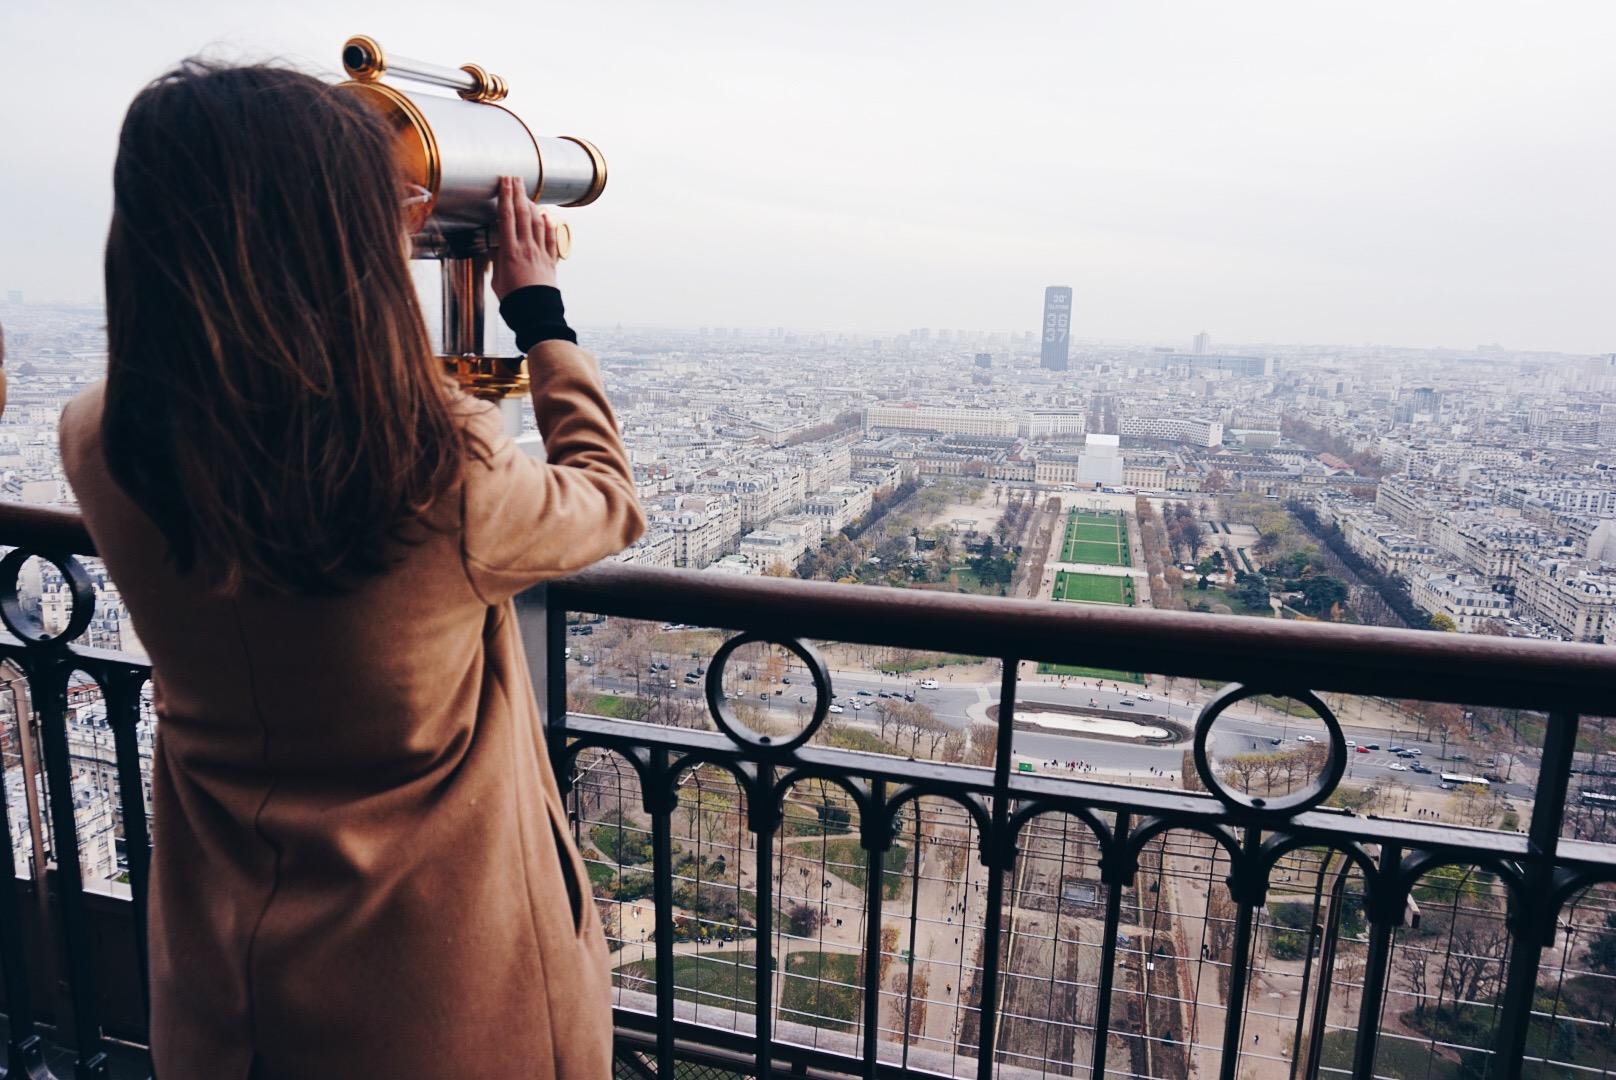 Student looks through viewfinder in Paris